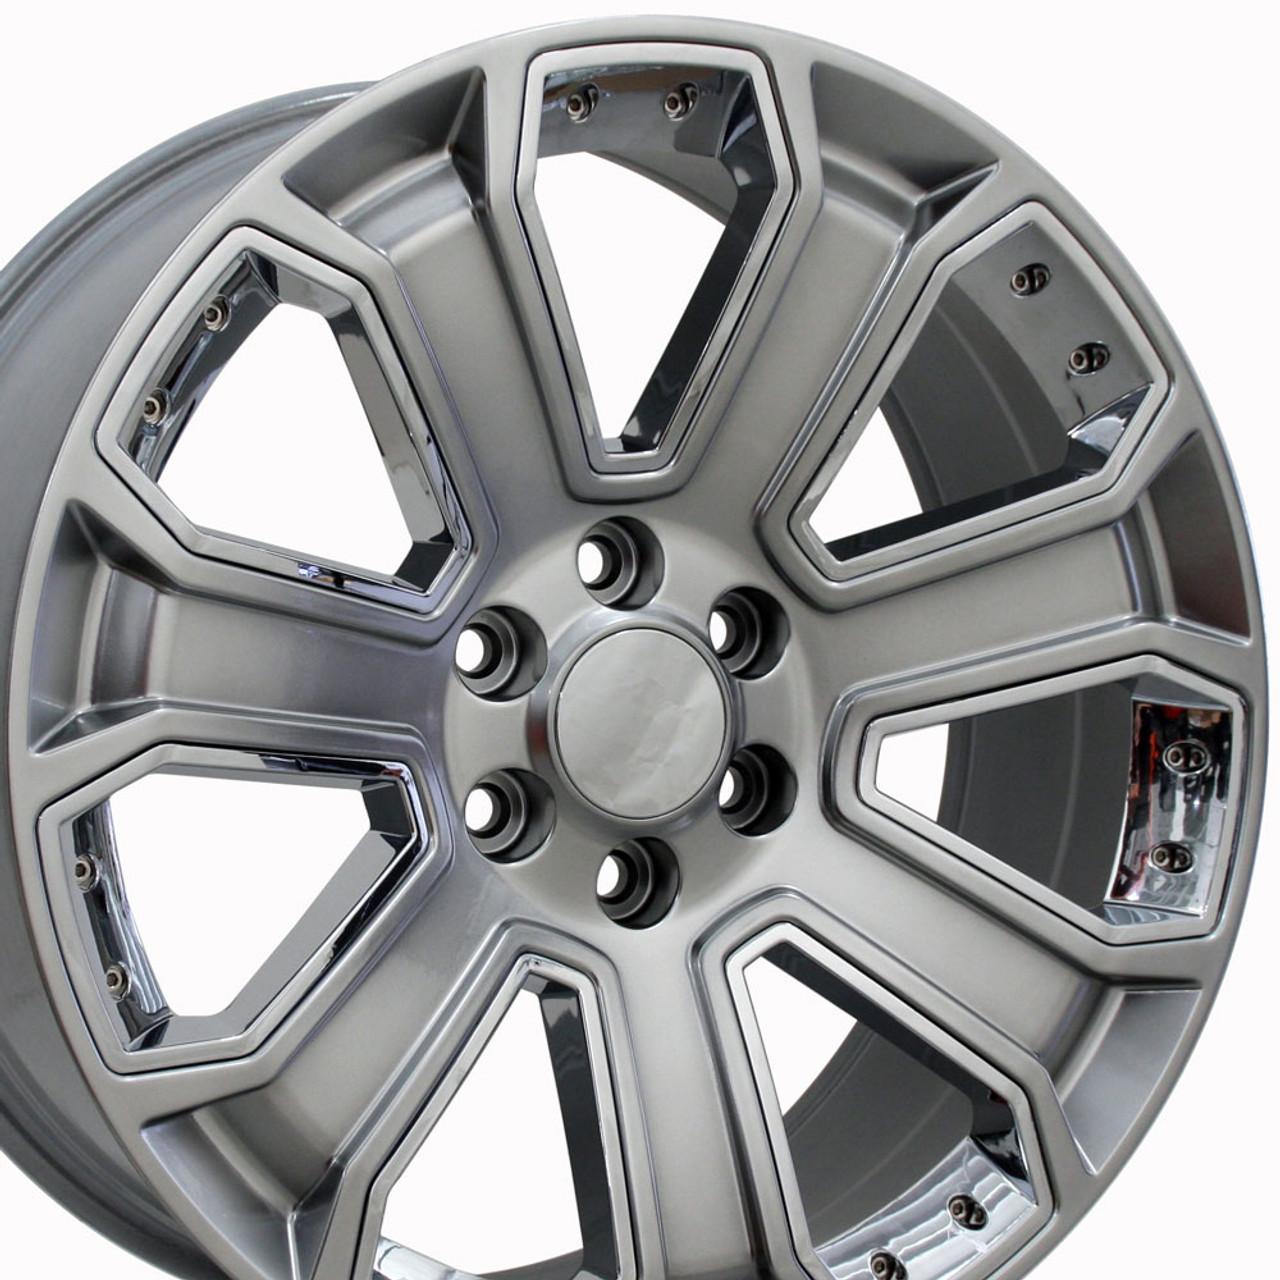 20 Gmc Denali Style Wheels Yukon Sierra Cadillac Fits Chevrolet Escalade Chevy Tahoe Silverado Hyper Black With Chrome Inserts Set Of 4 20x8 5 Rims Stock Wheel Solutions